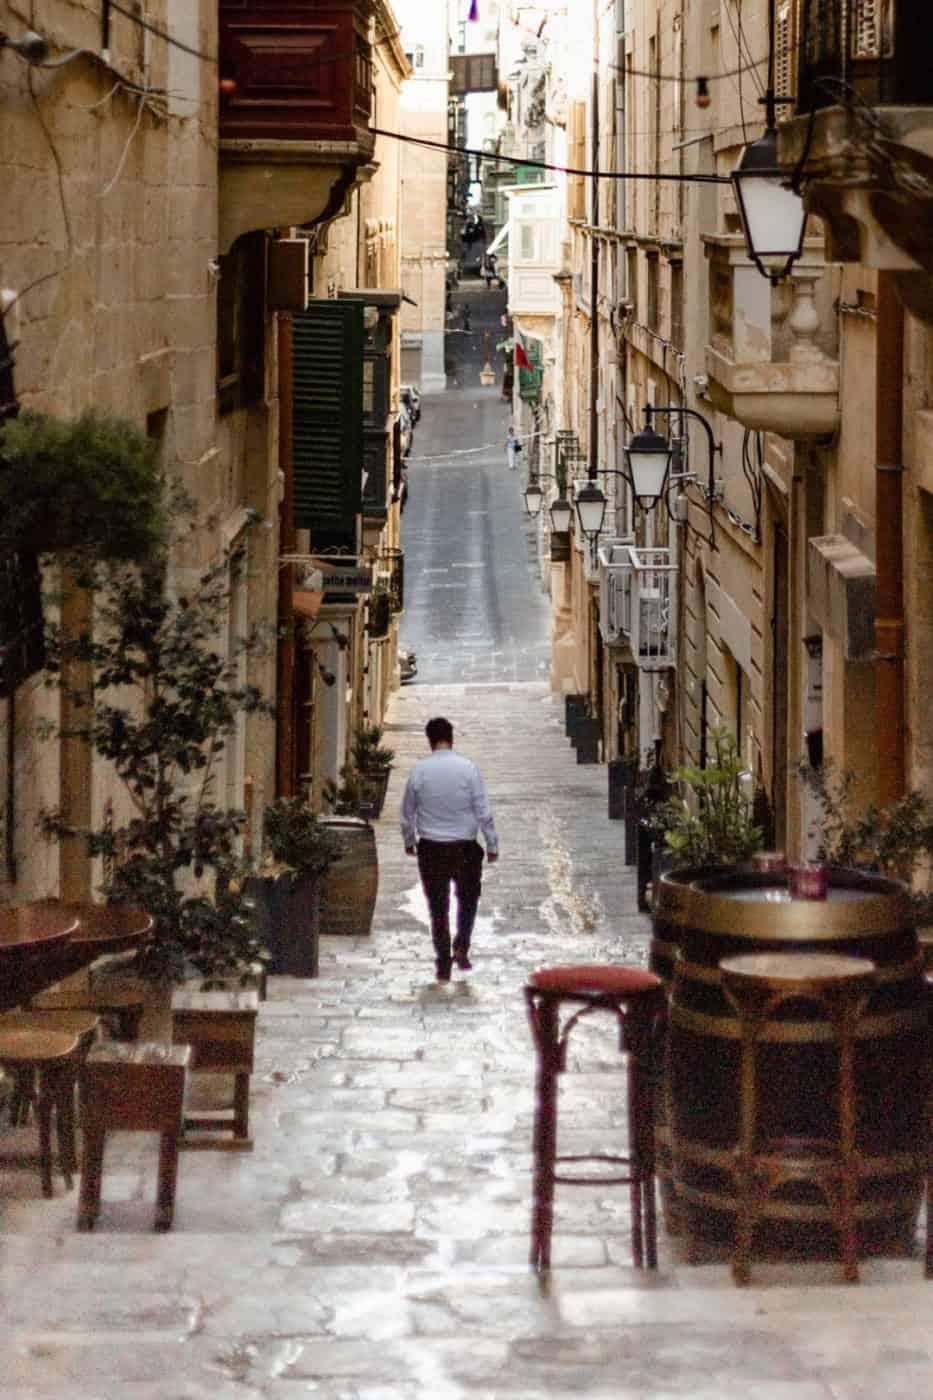 A street in Valletta Malta